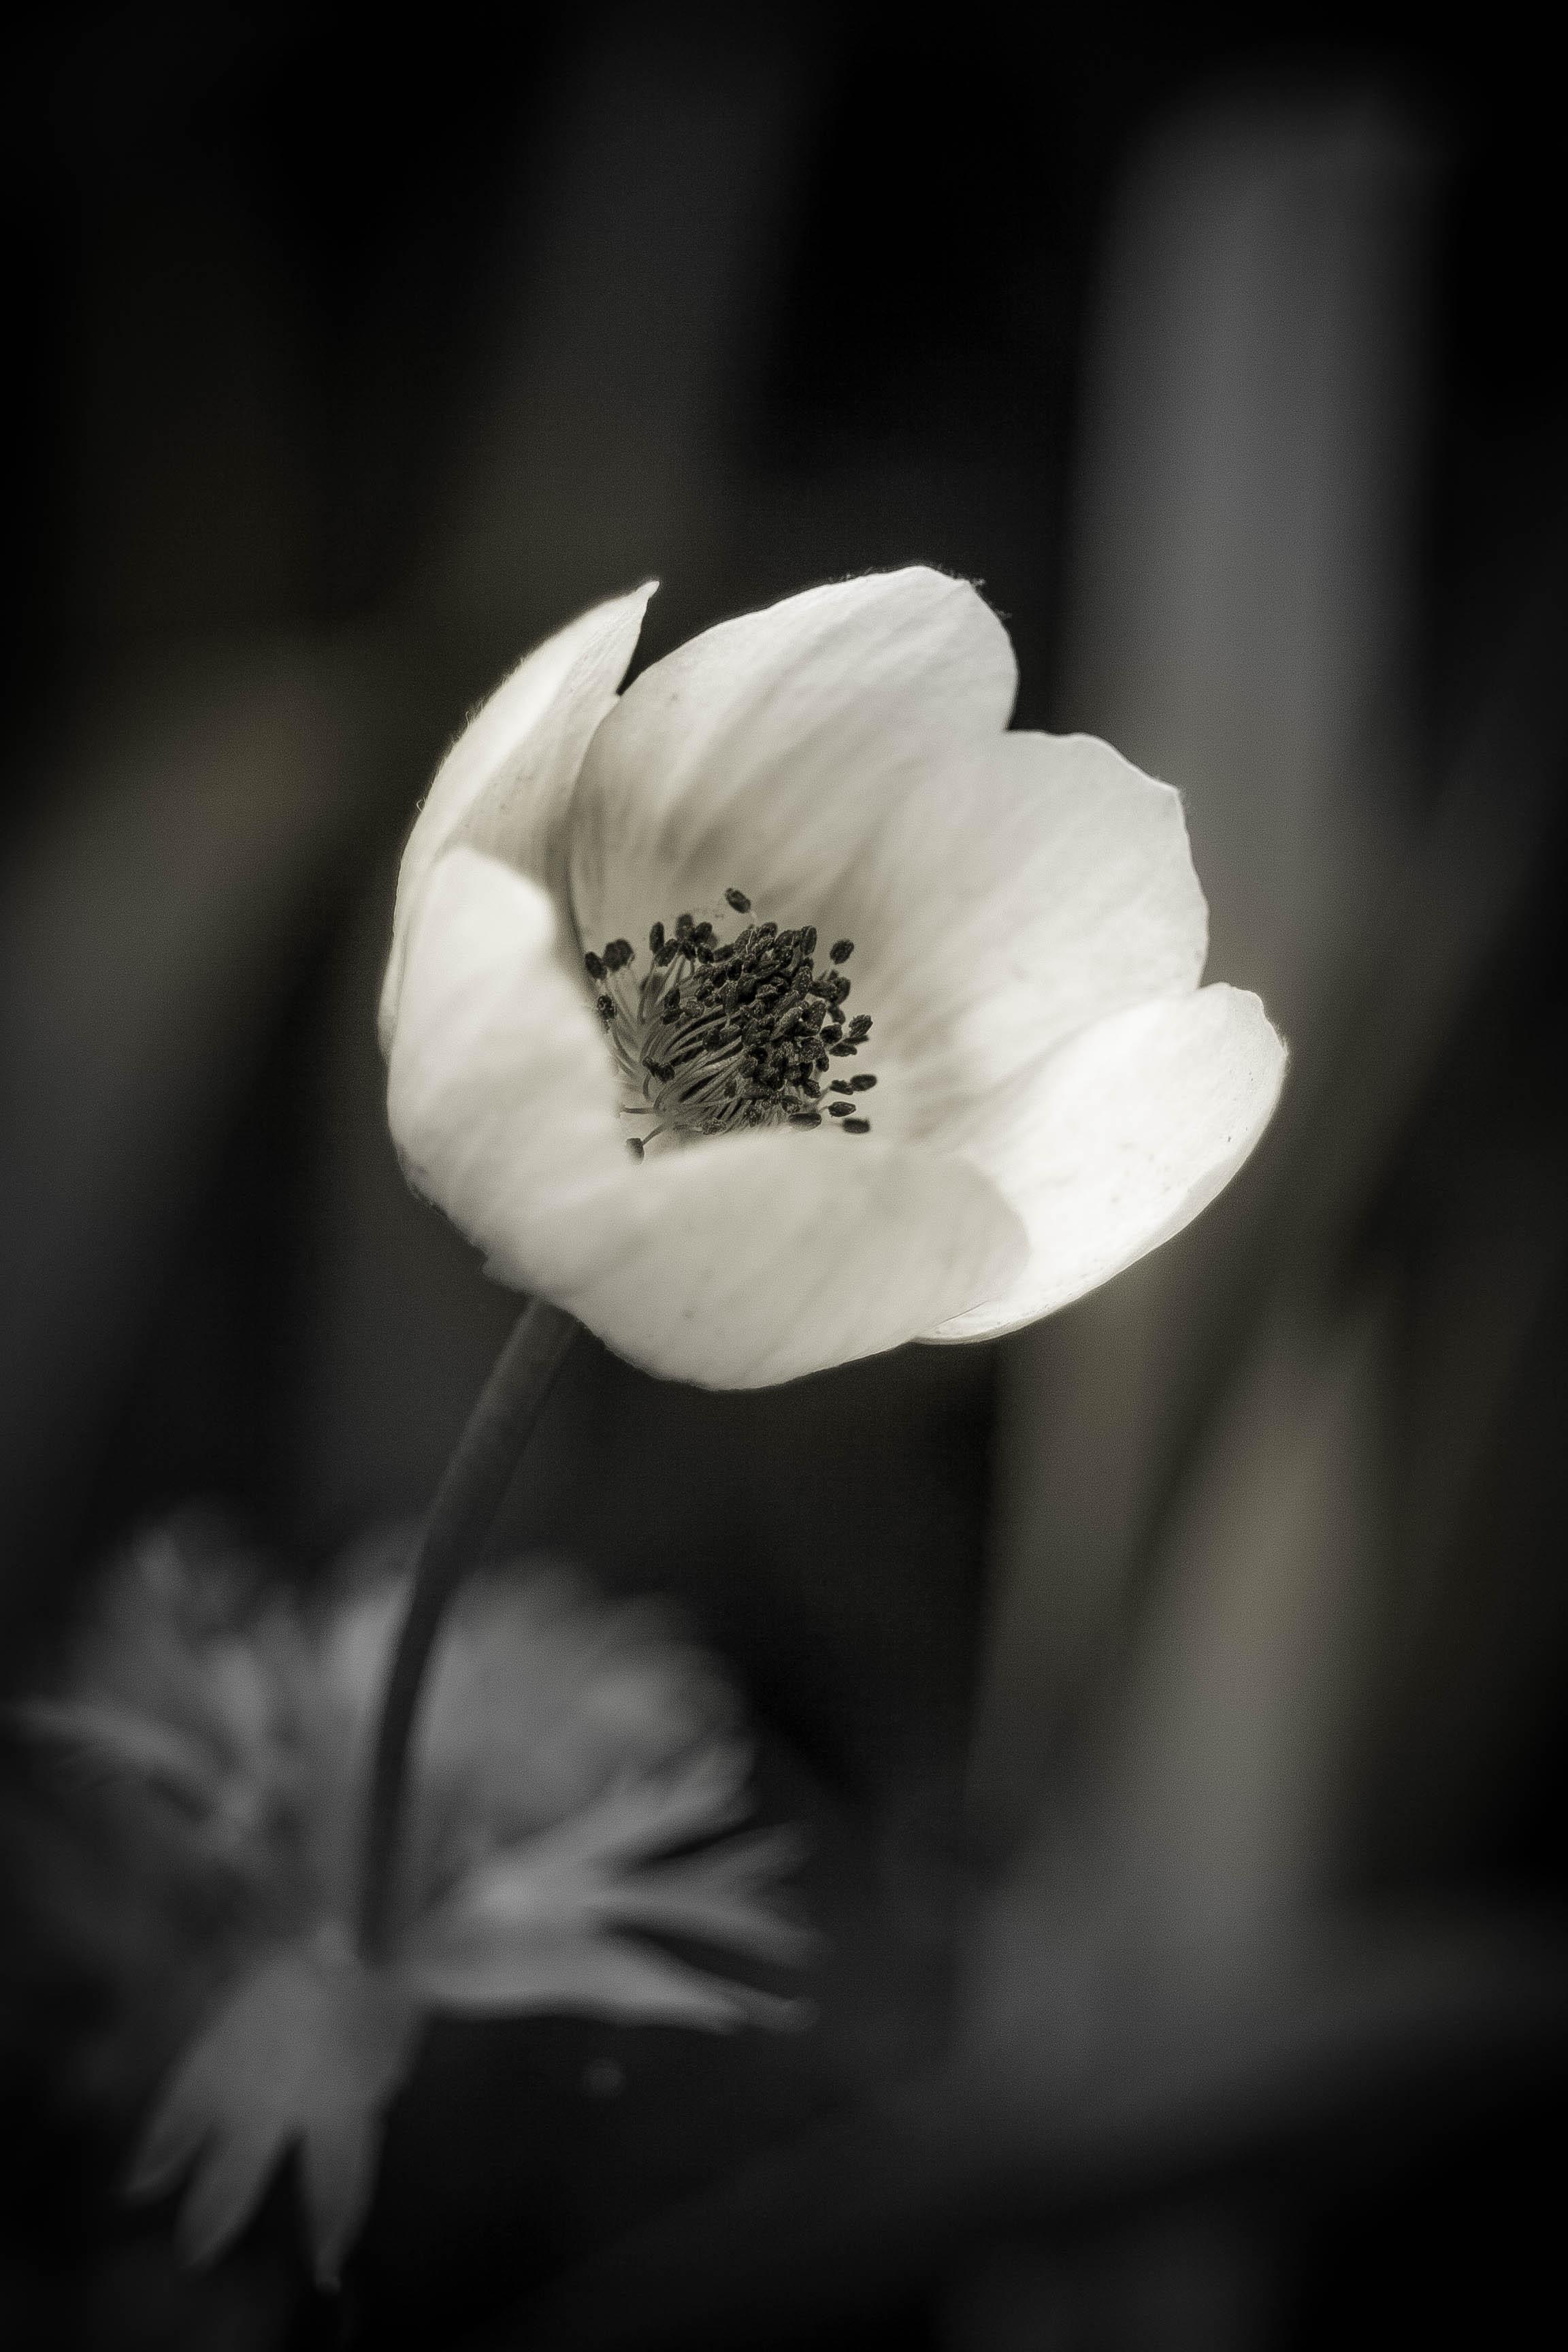 Black and White Anemone.